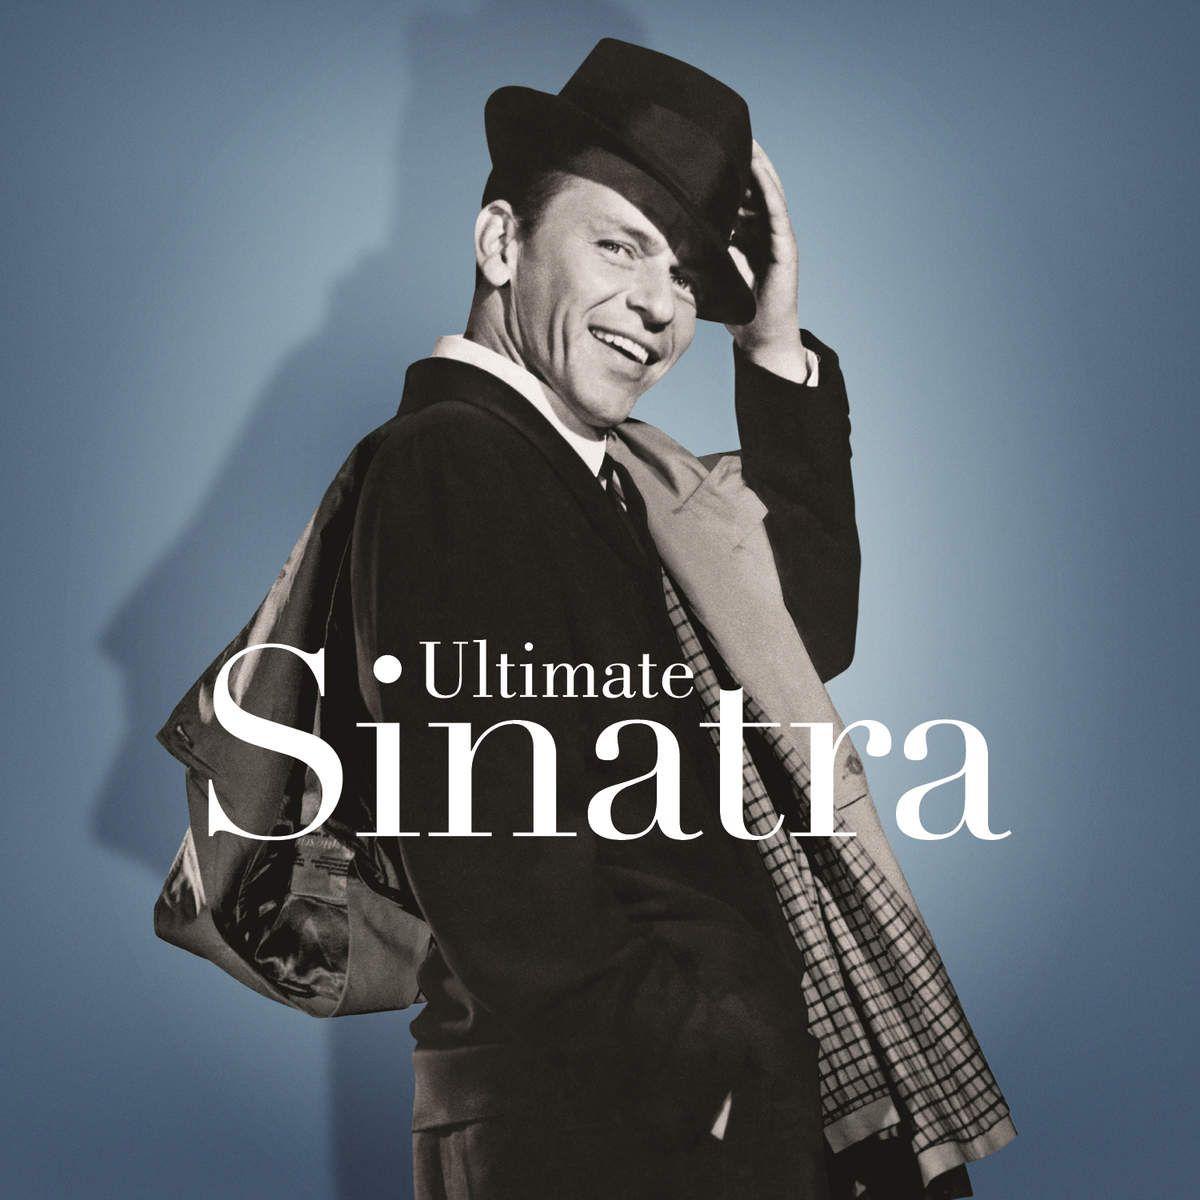 Frank Sinatra - Ultimate Sinatra album cover